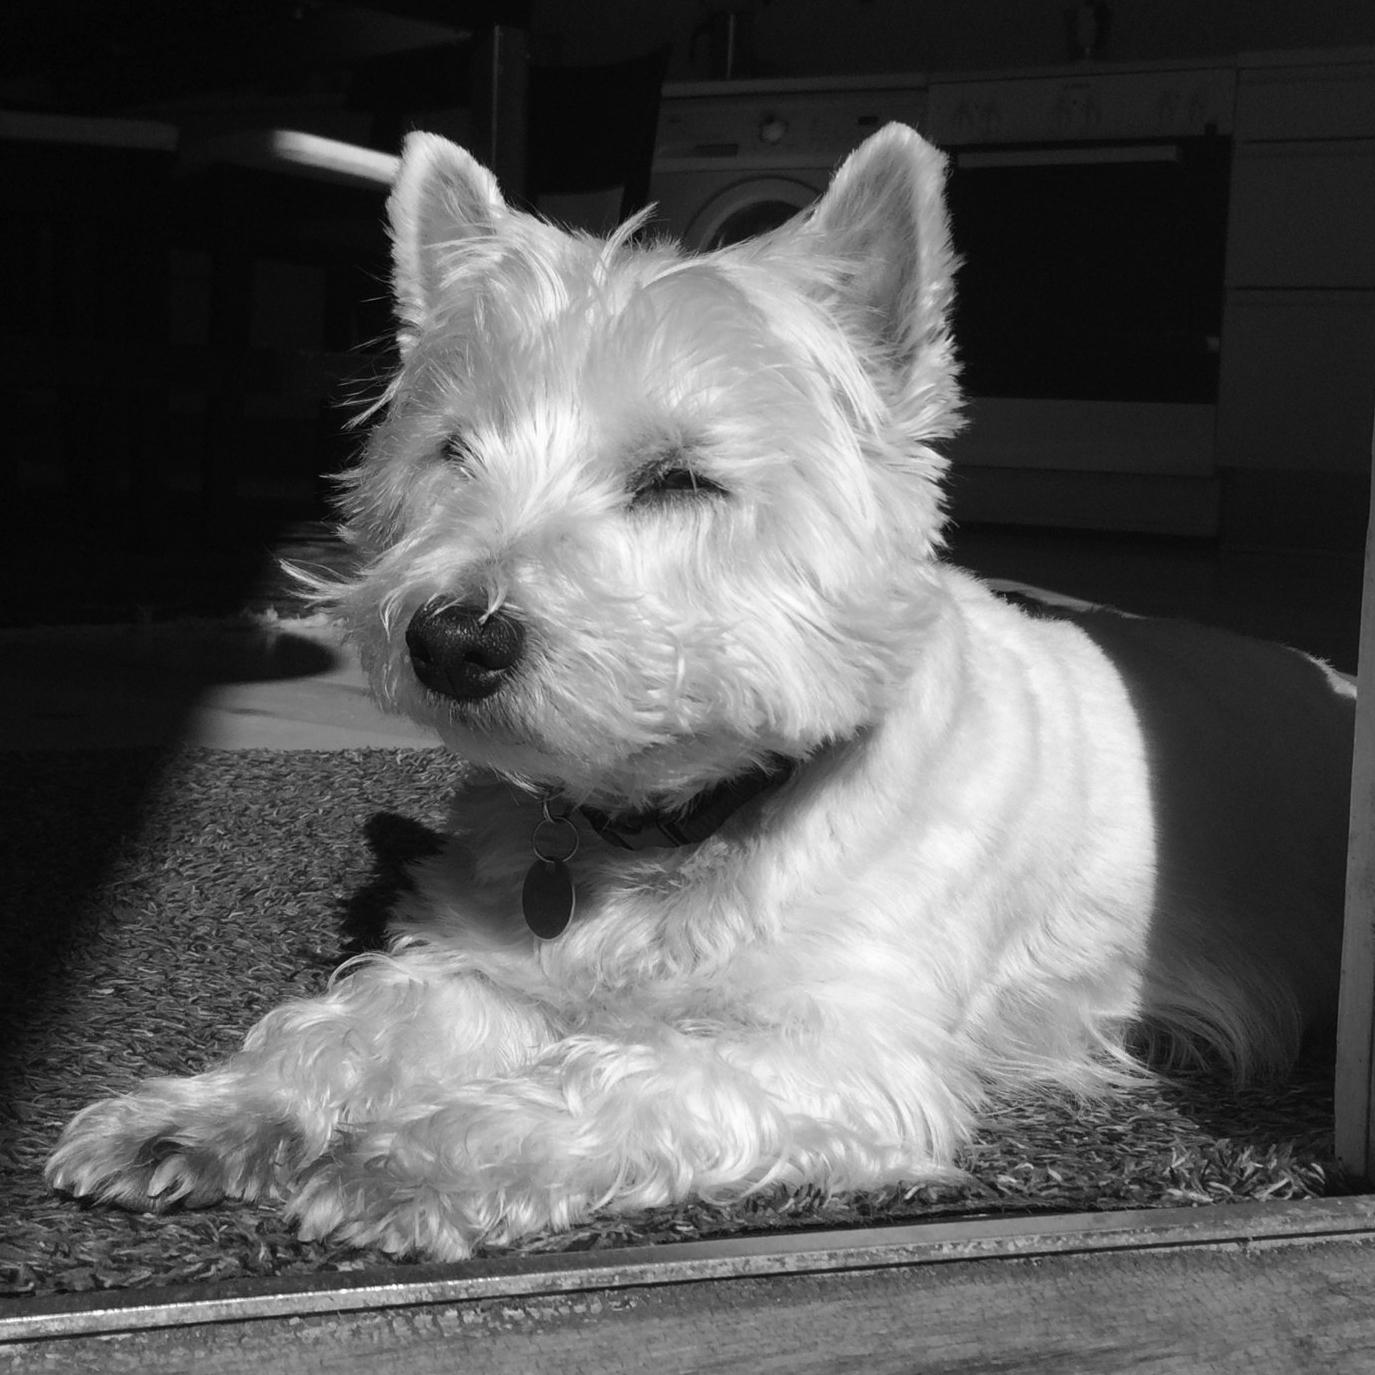 Vika  Titel: Kontorhund på deltid  Firma: DogNition  Mail: sendflere@godbidder.org  Telefon: +45 30 28 84 42